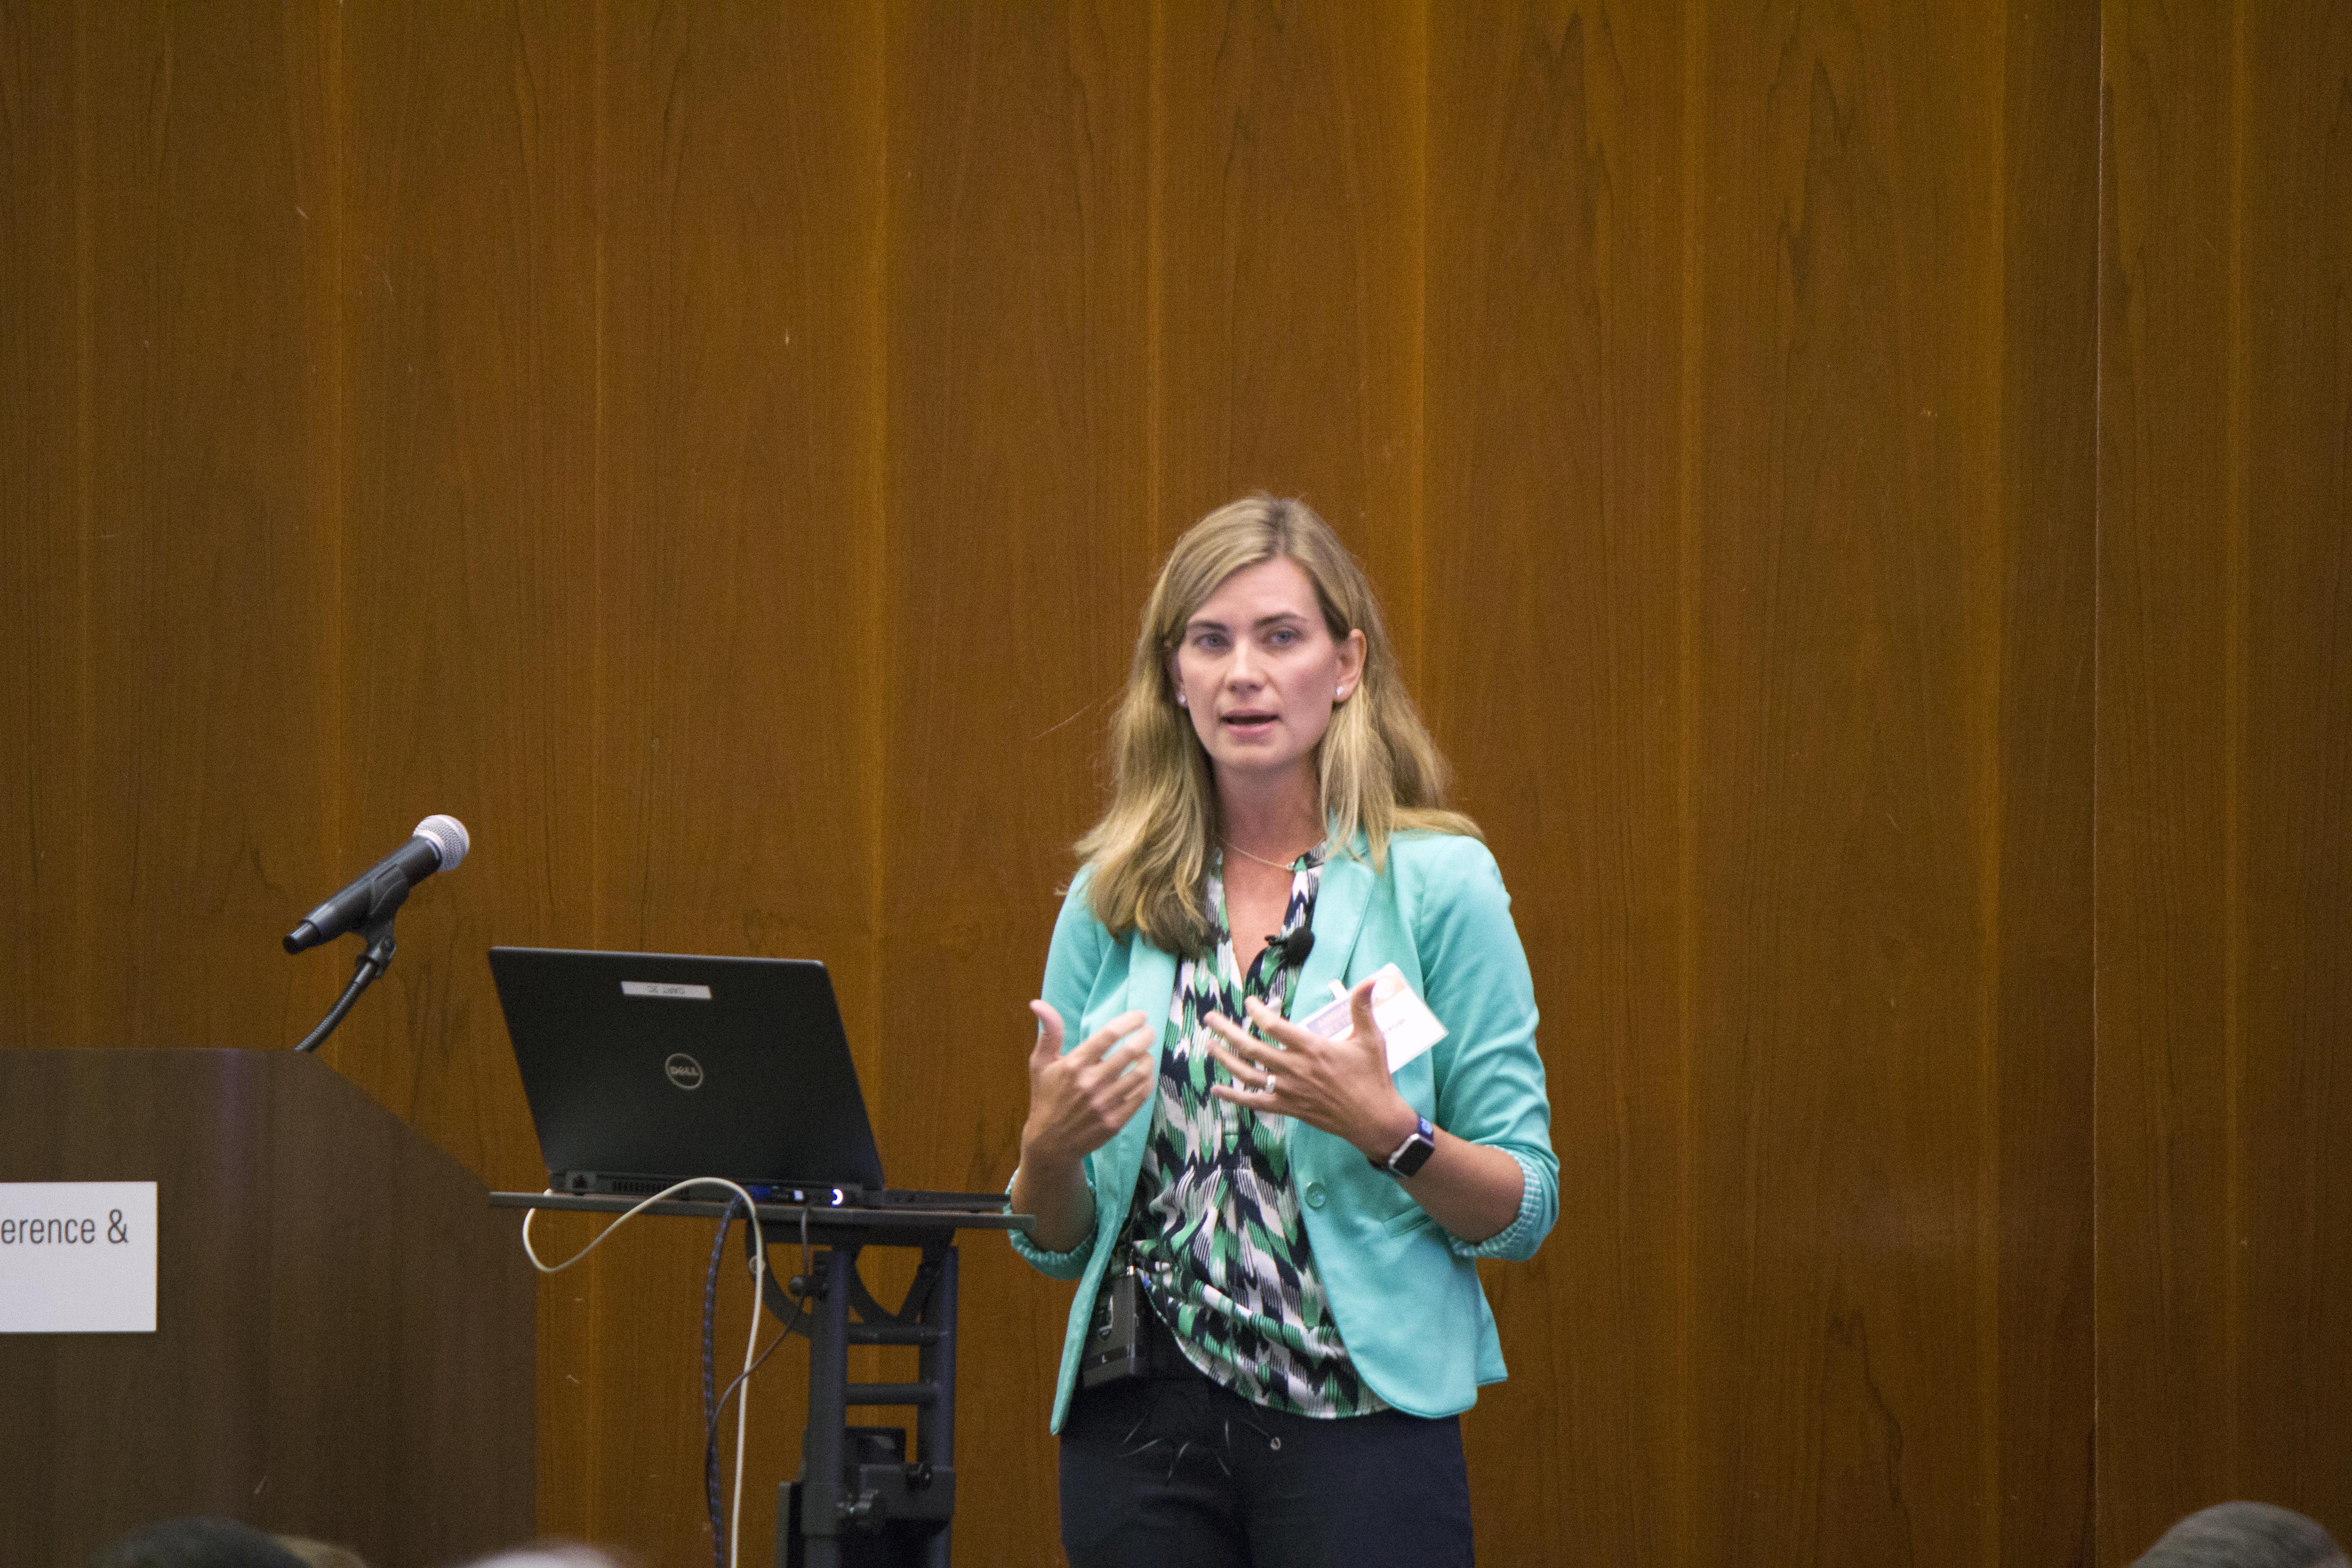 Meg Zomorodi, Assistant Provost for Interprofessional Education and Practice, UNC-Chapel Hill